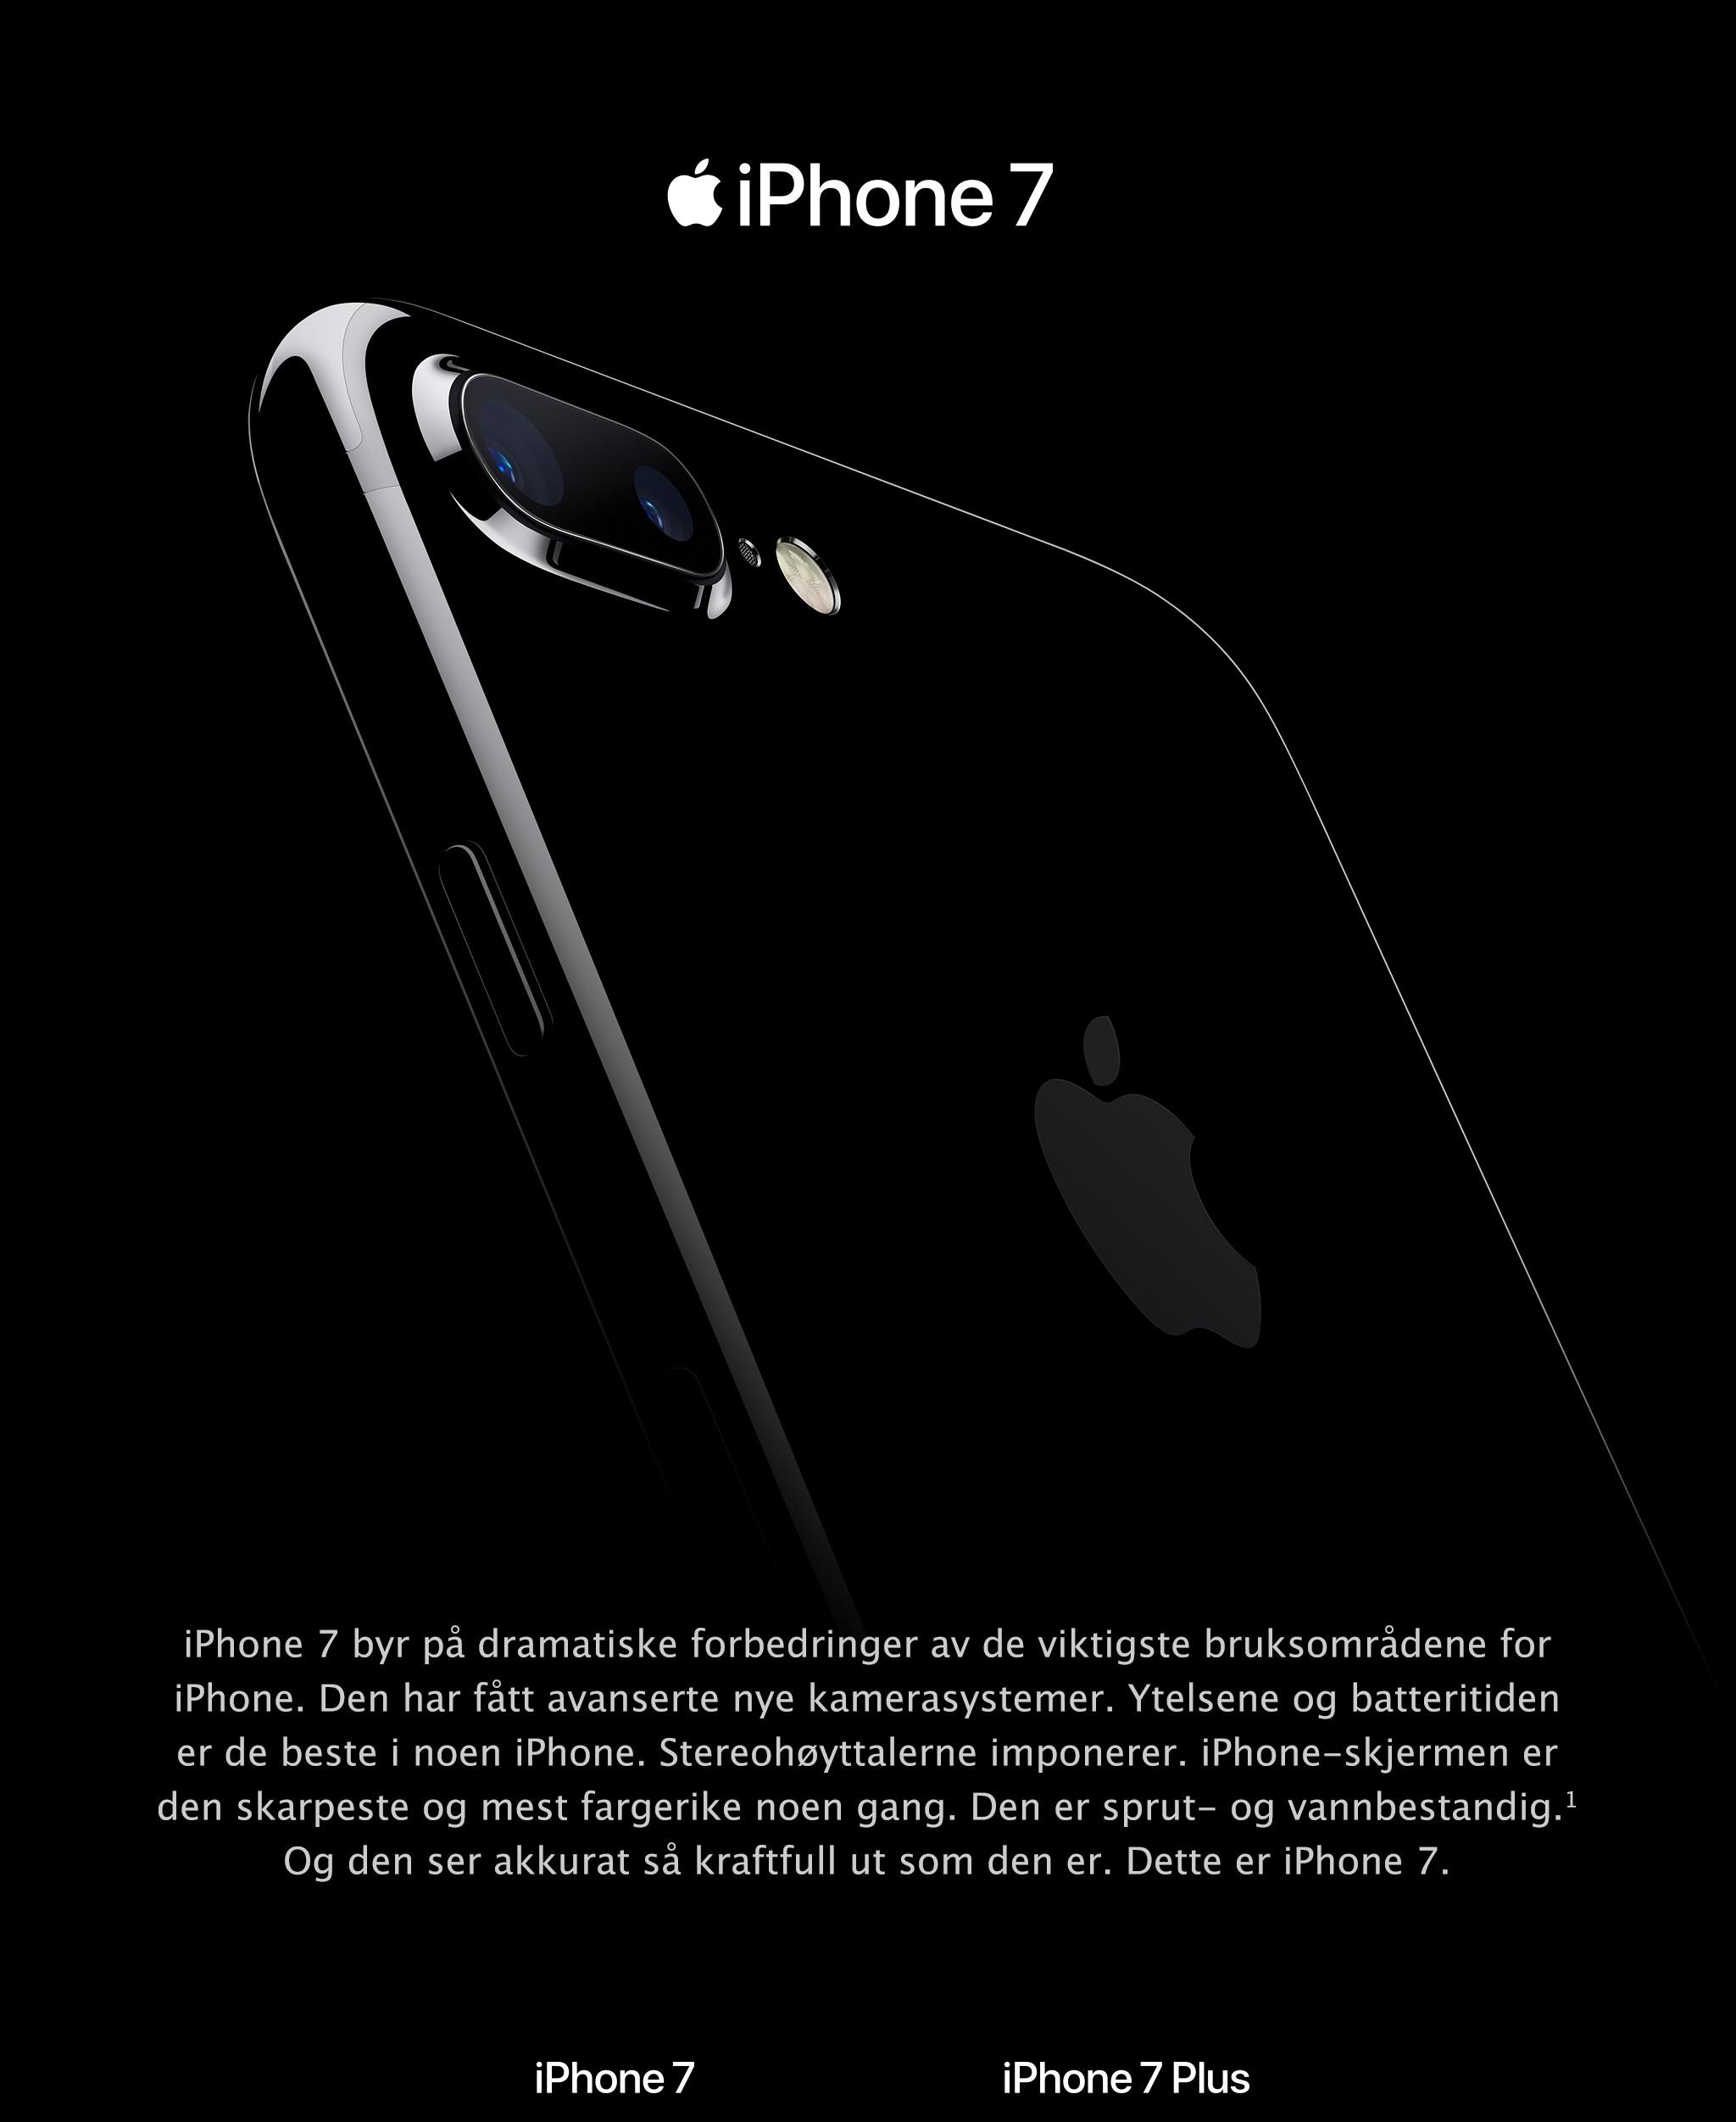 Best pris p Apple iPhone 7 32GB - Se priser fr kjp Best pris p Apple iPhone 7 32GB Mobiltelefon - Prisjakt IPhone 7 og iPhone 7, plus - Elkjp